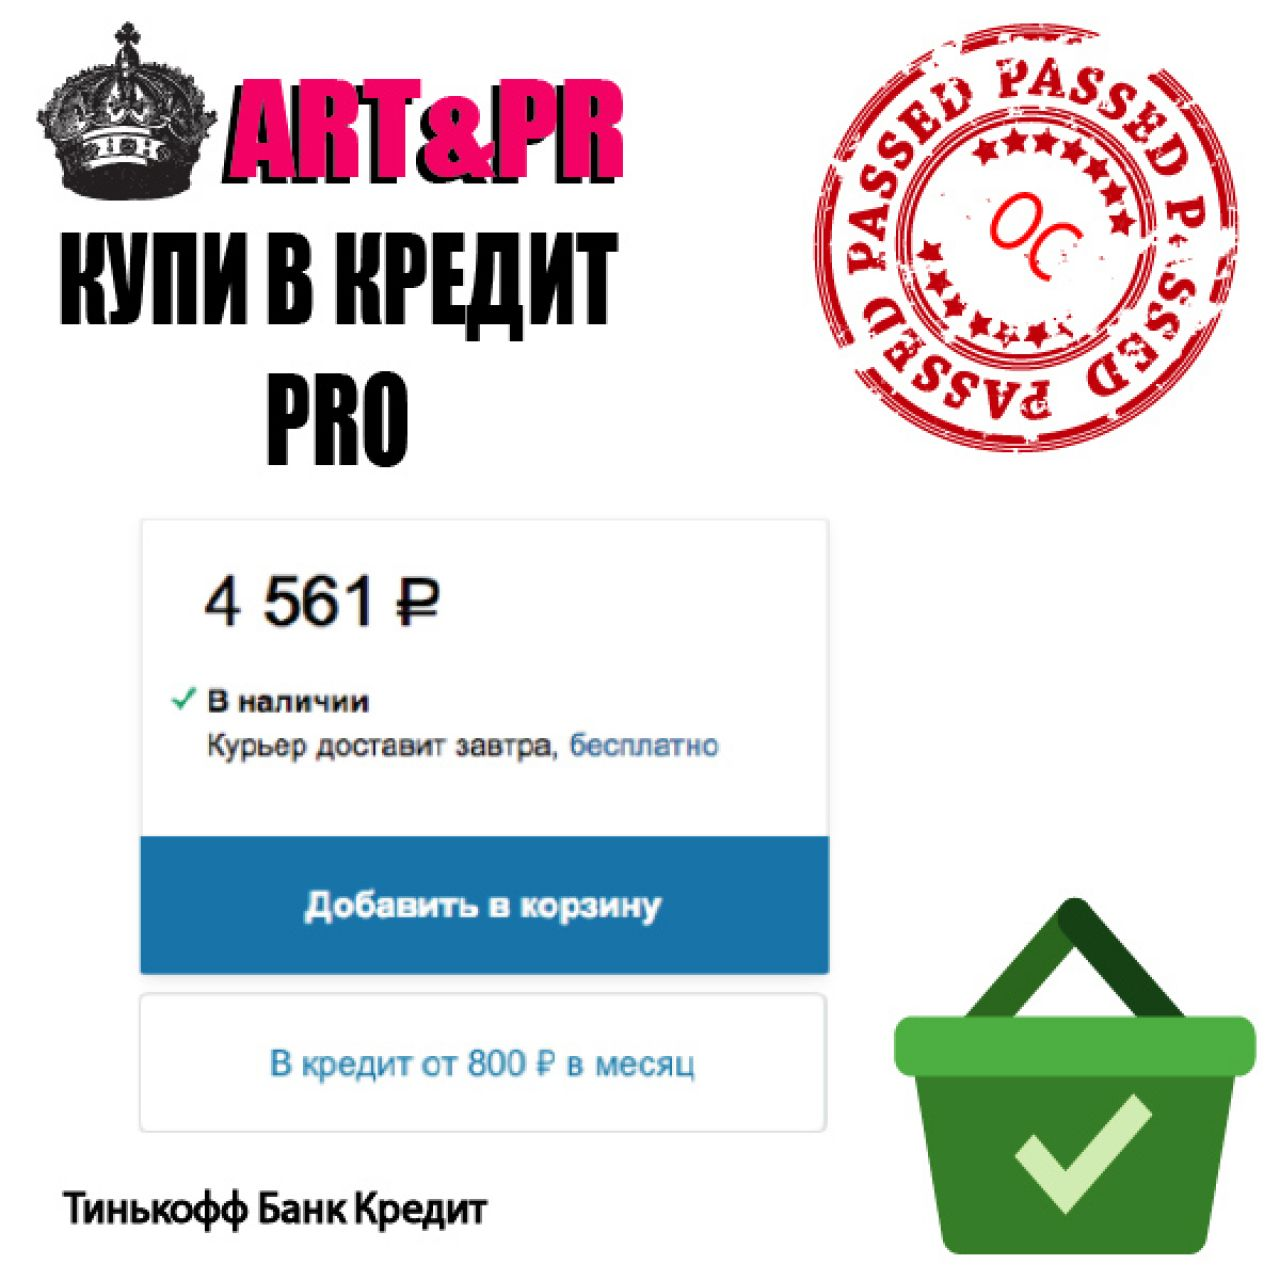 Купи в кредит (Тинькофф Кредит) PRO из категории Оплата для CMS OpenCart (ОпенКарт)